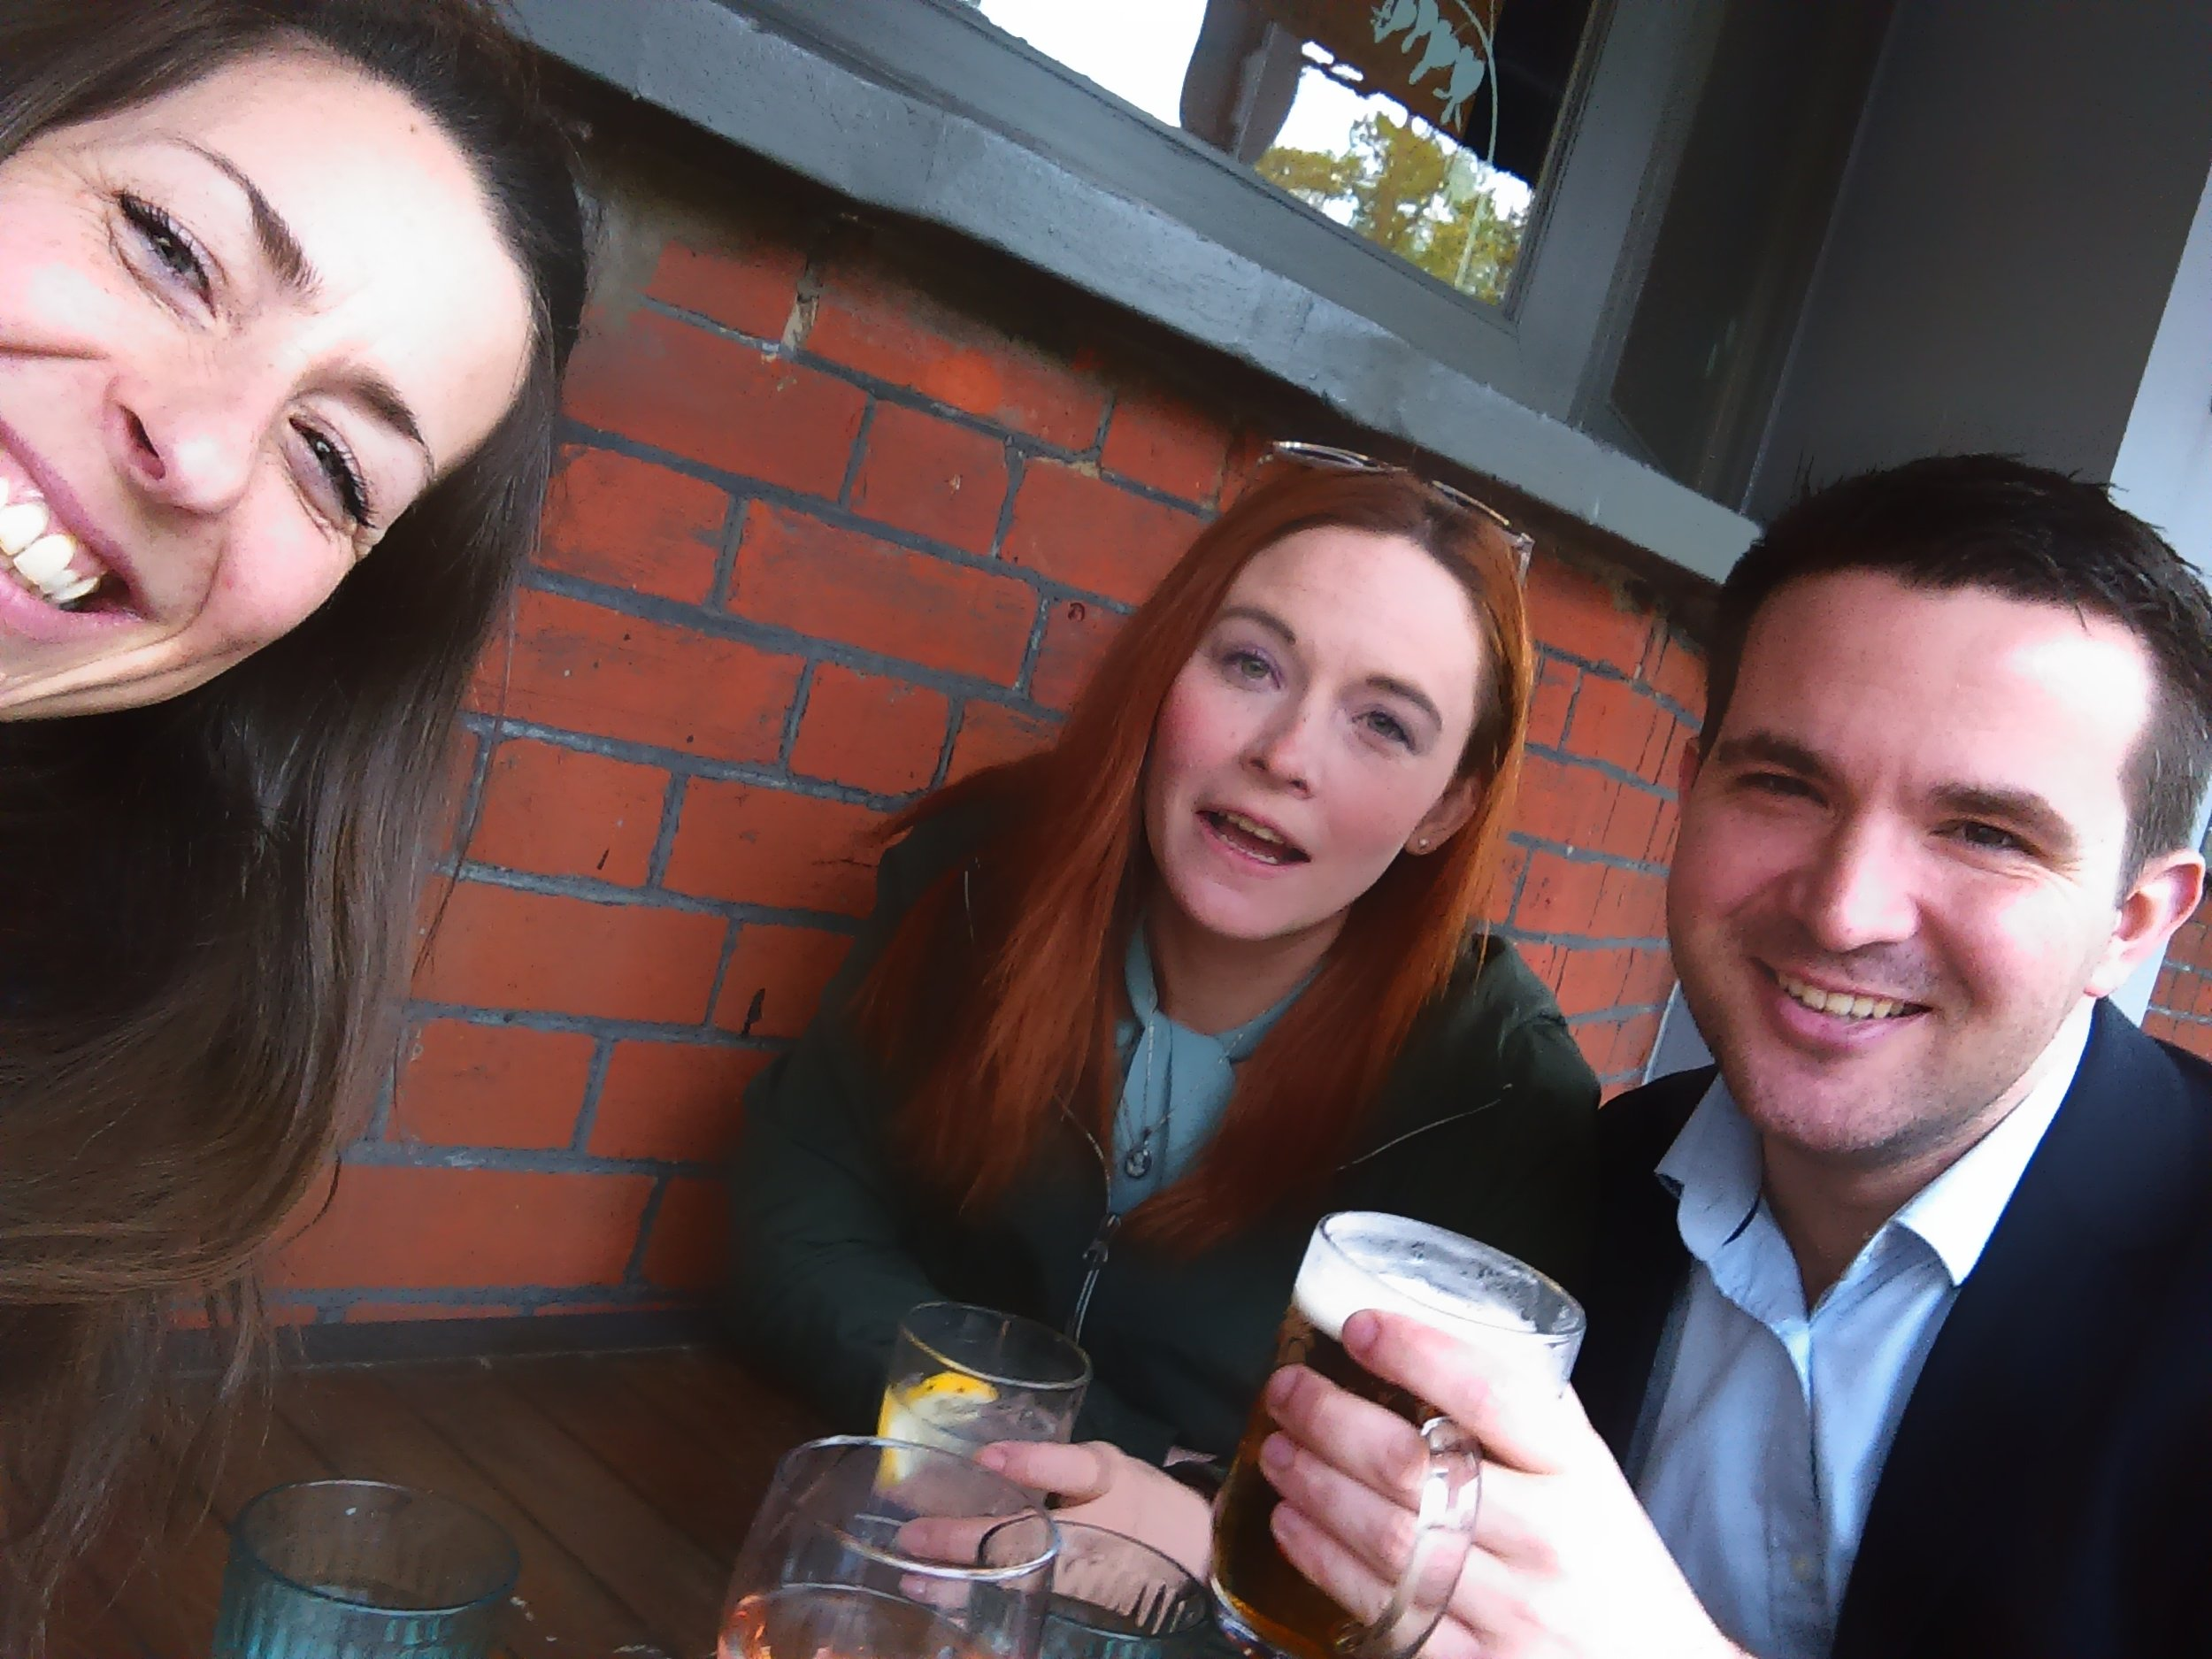 Post engagement session celebratory drinks……..